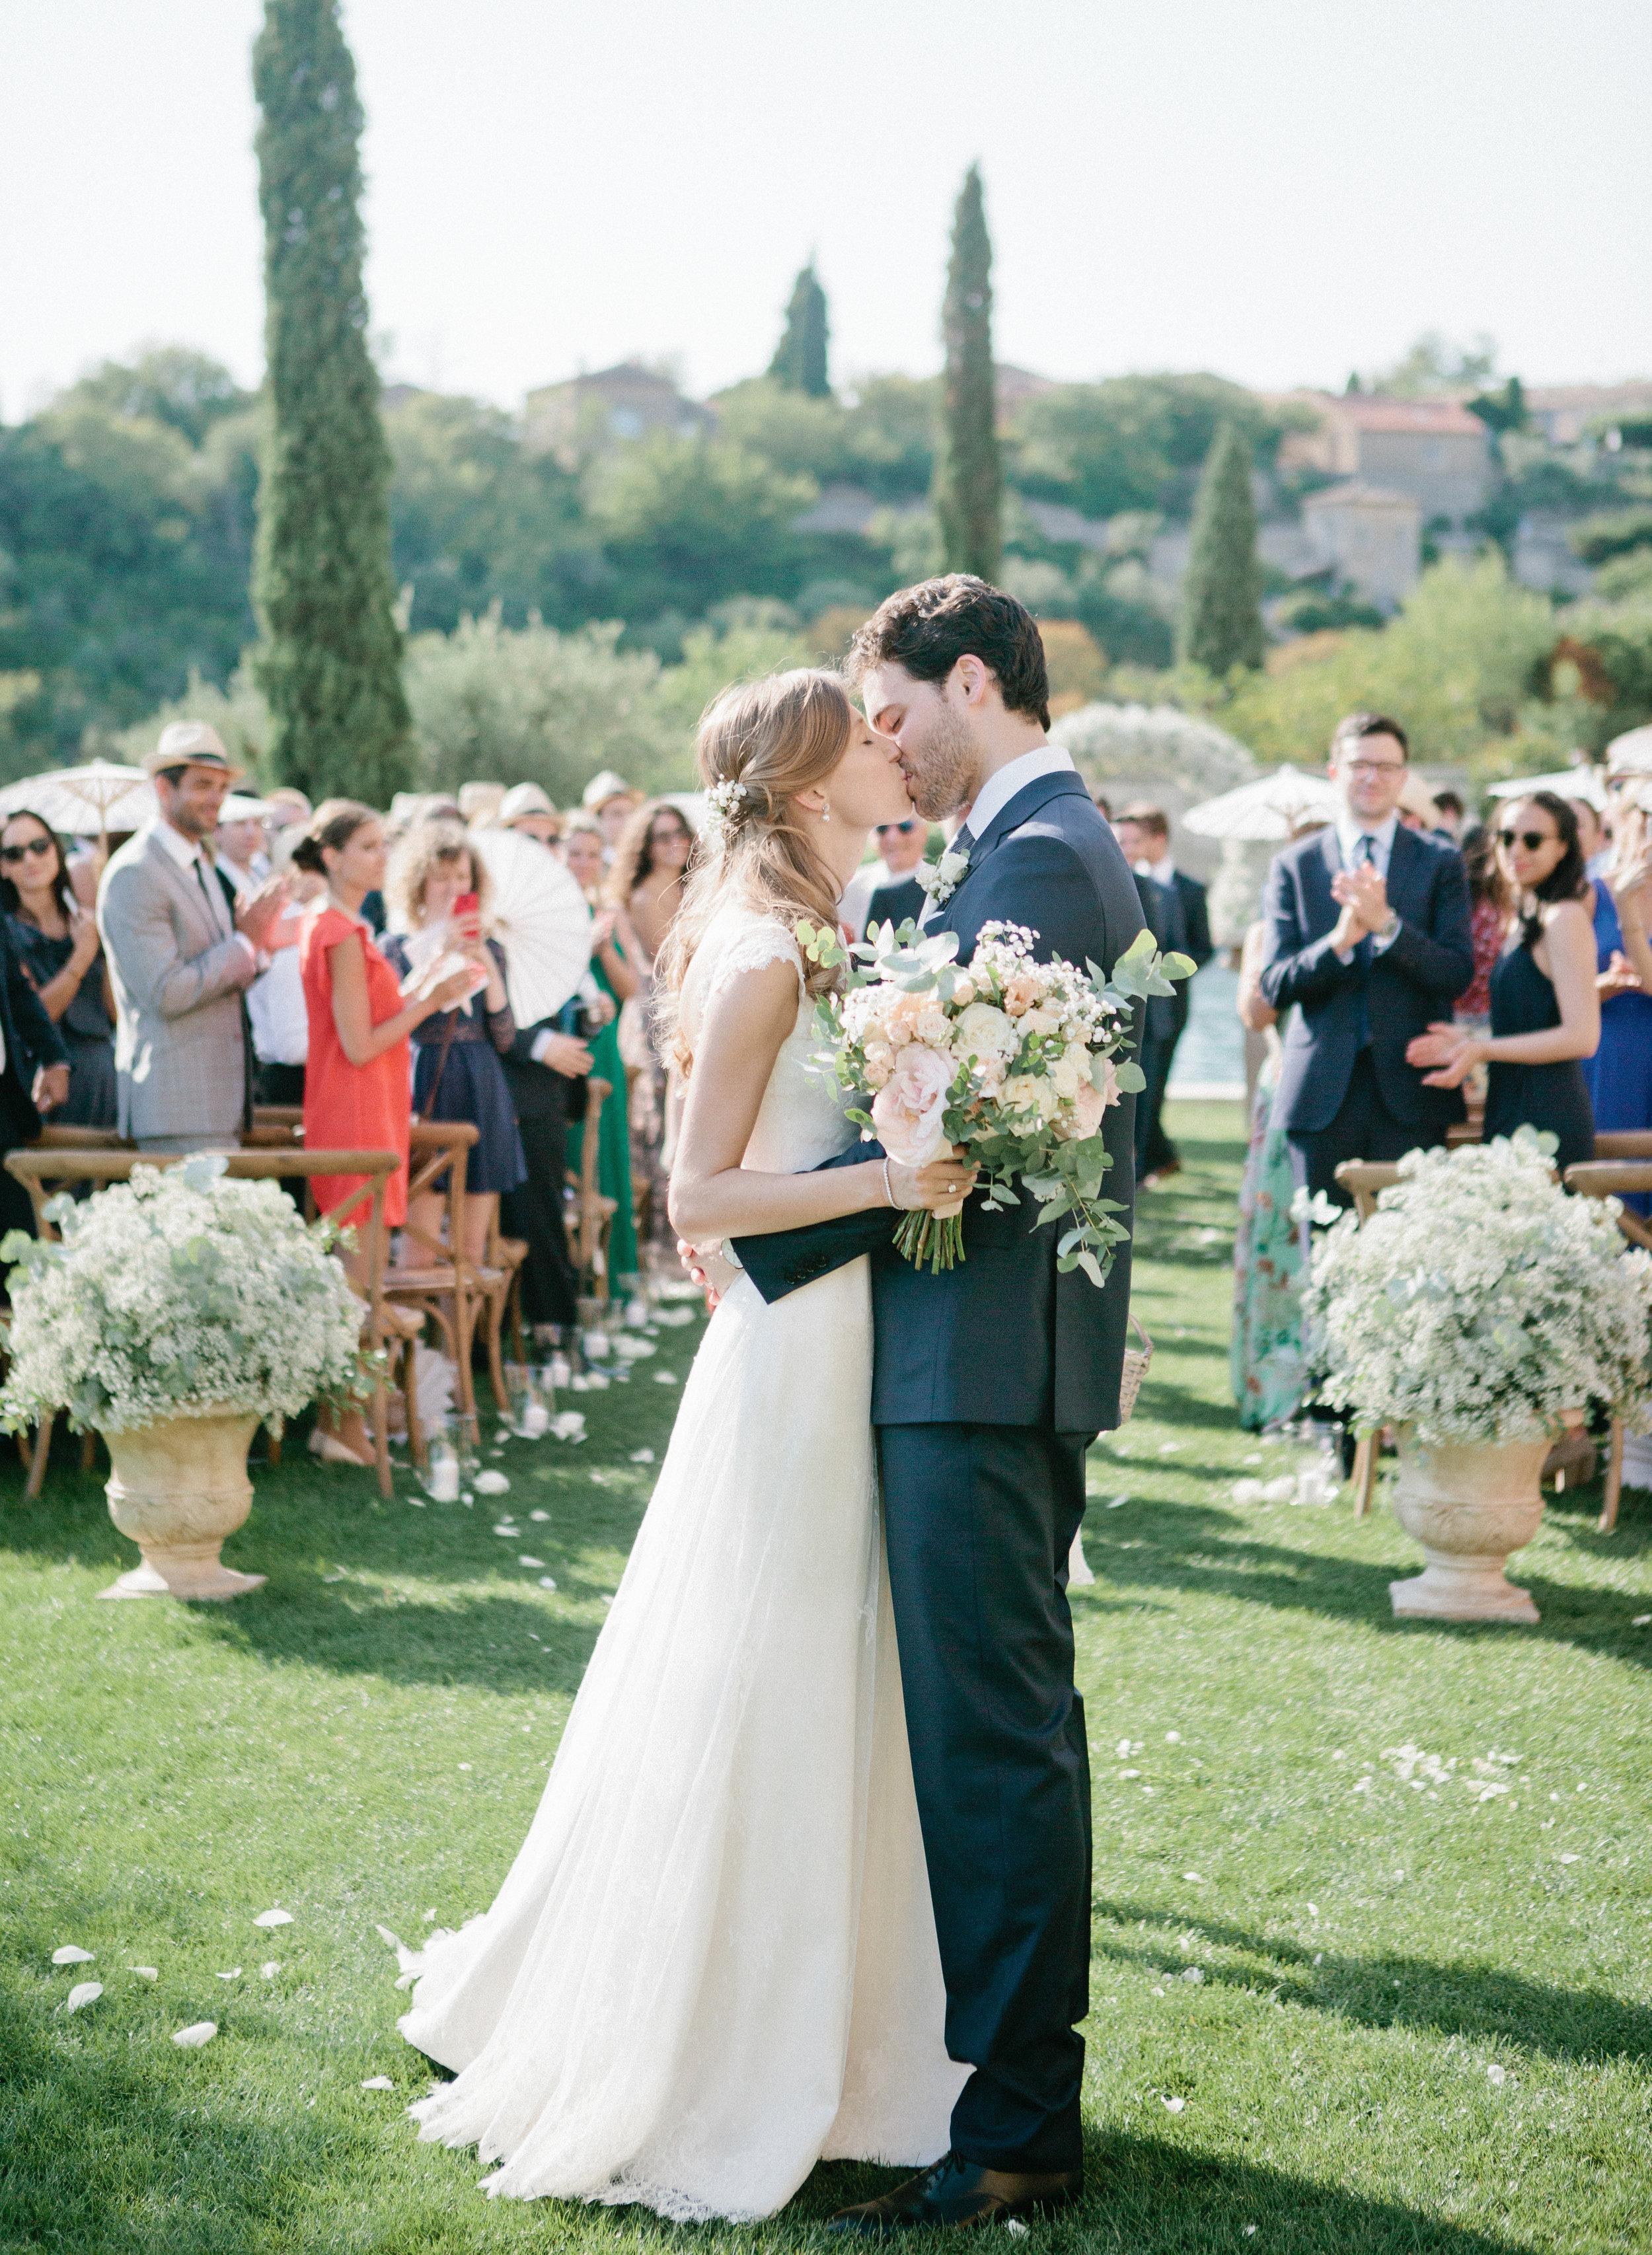 provence-wedding-rory-wylie.jpg-64.jpg